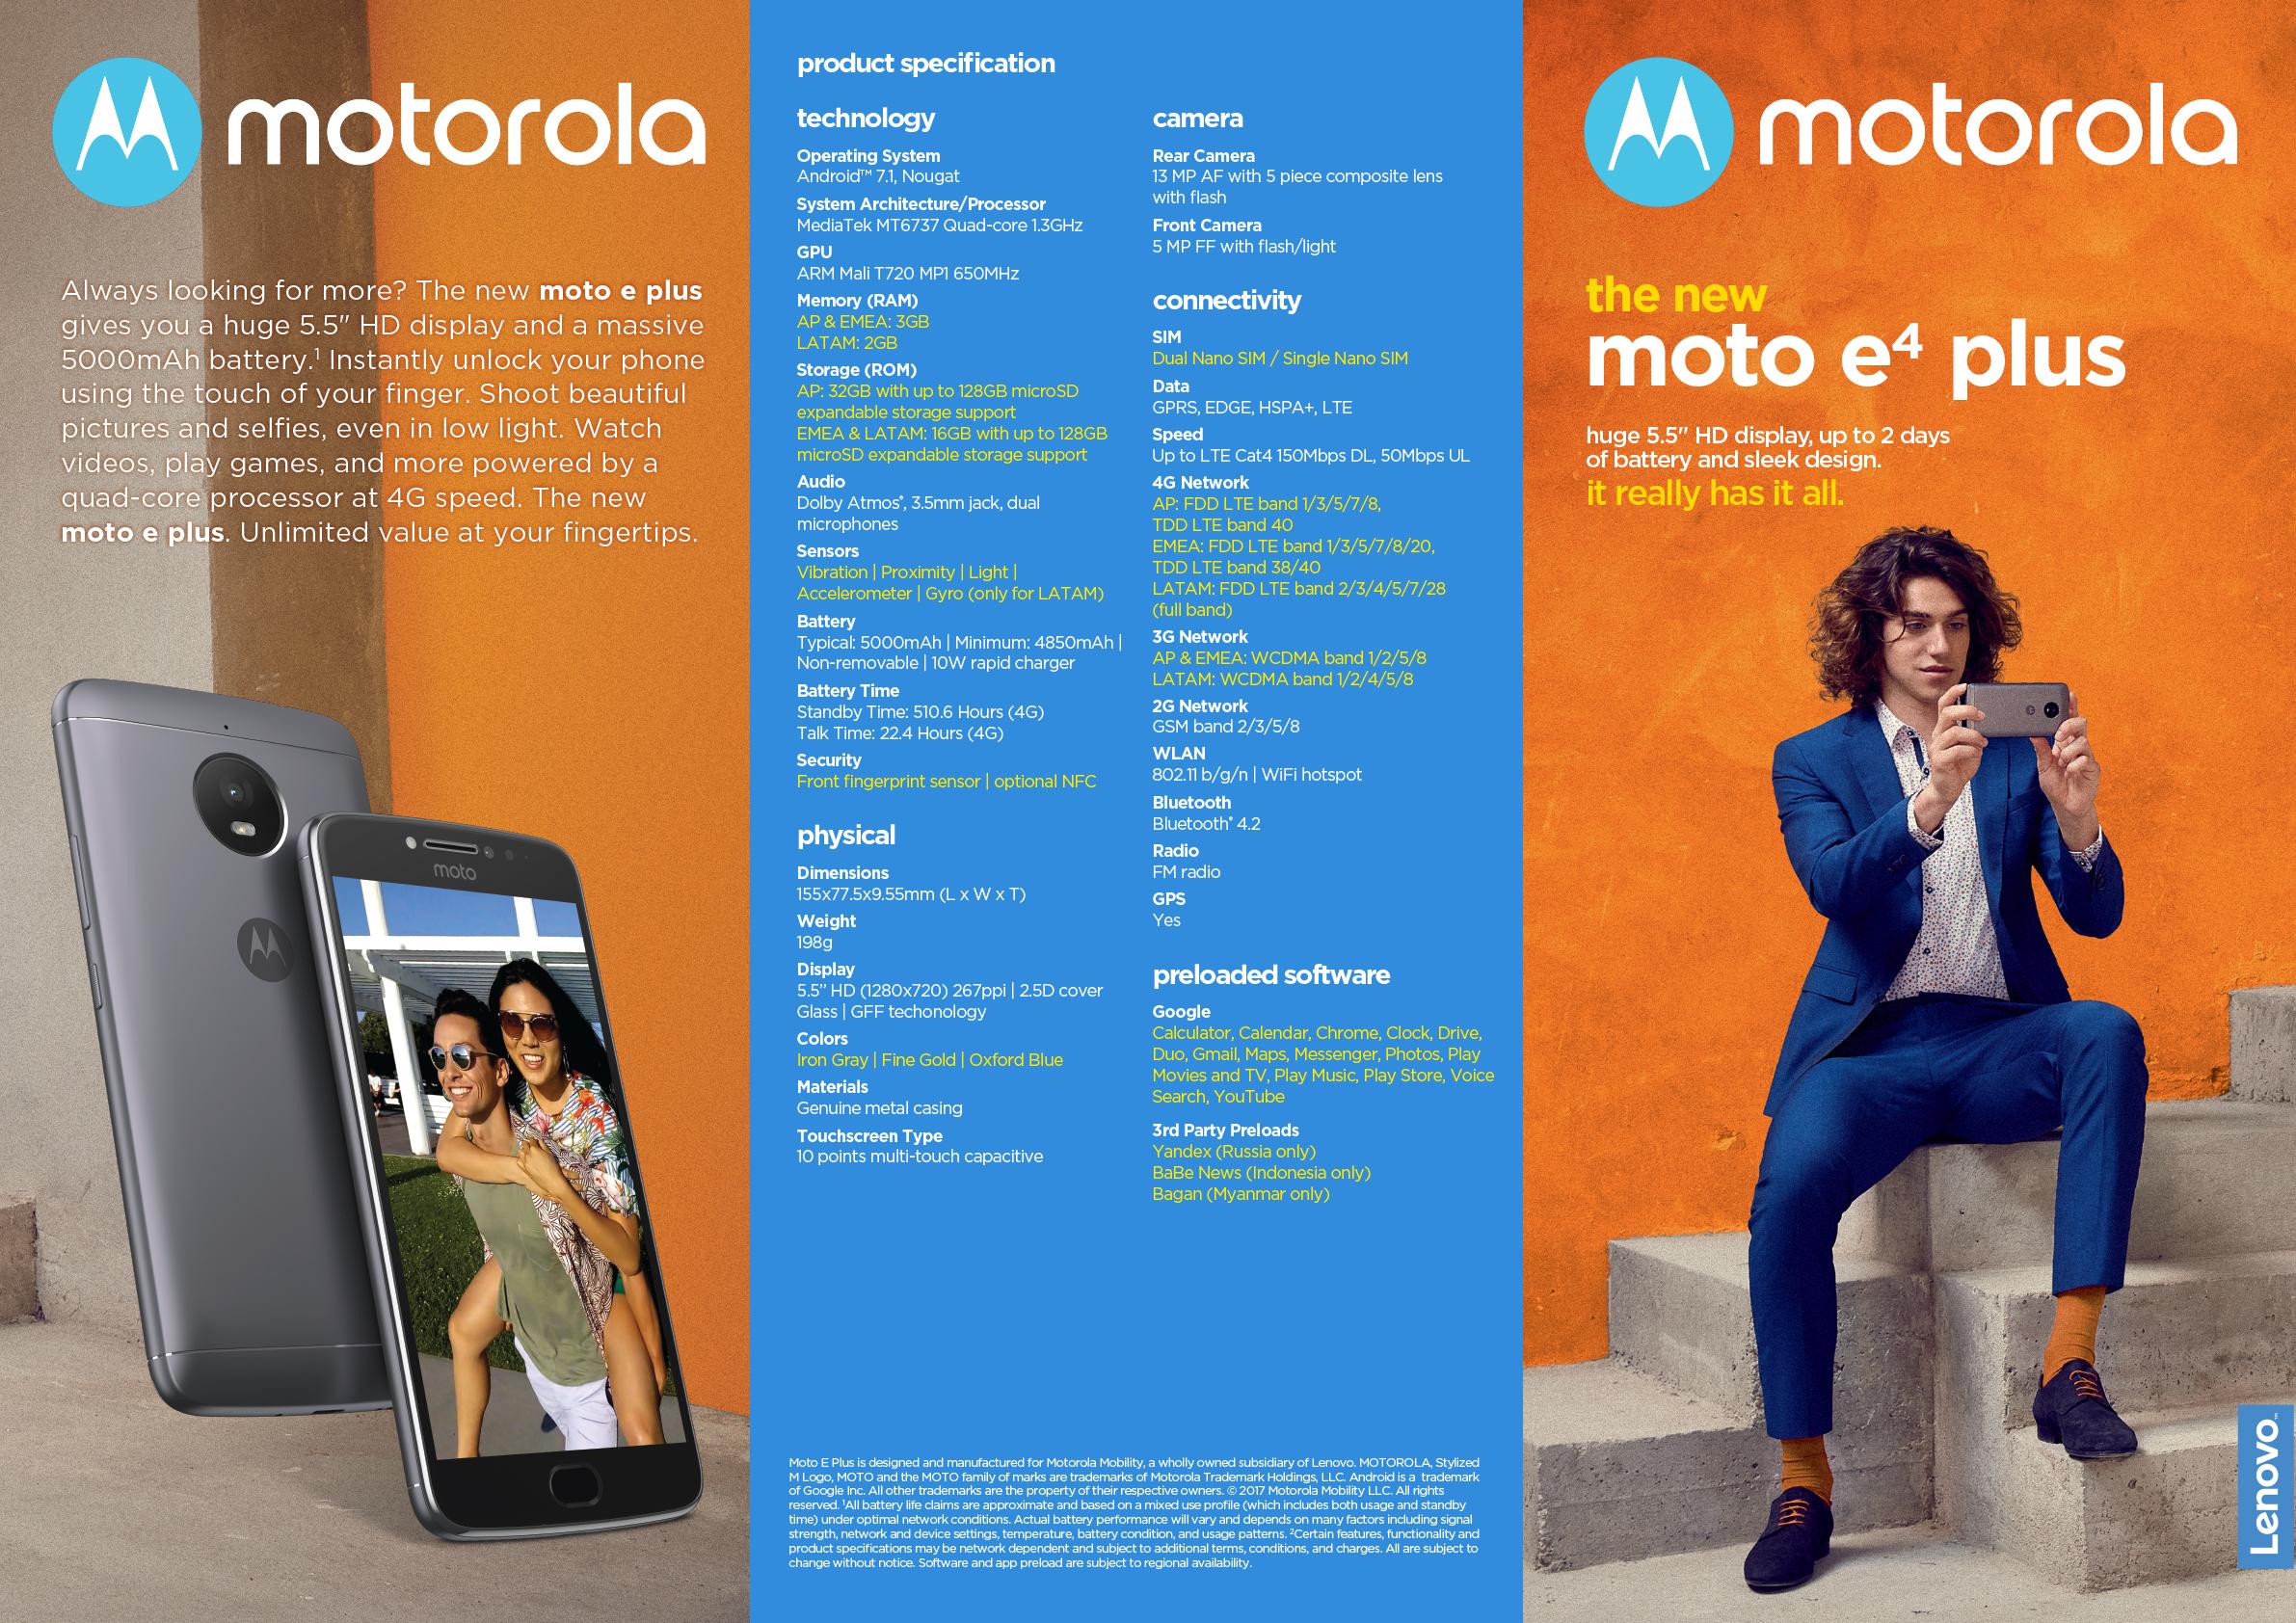 Moto E4 Plus ROW - Brochure-1.jpg